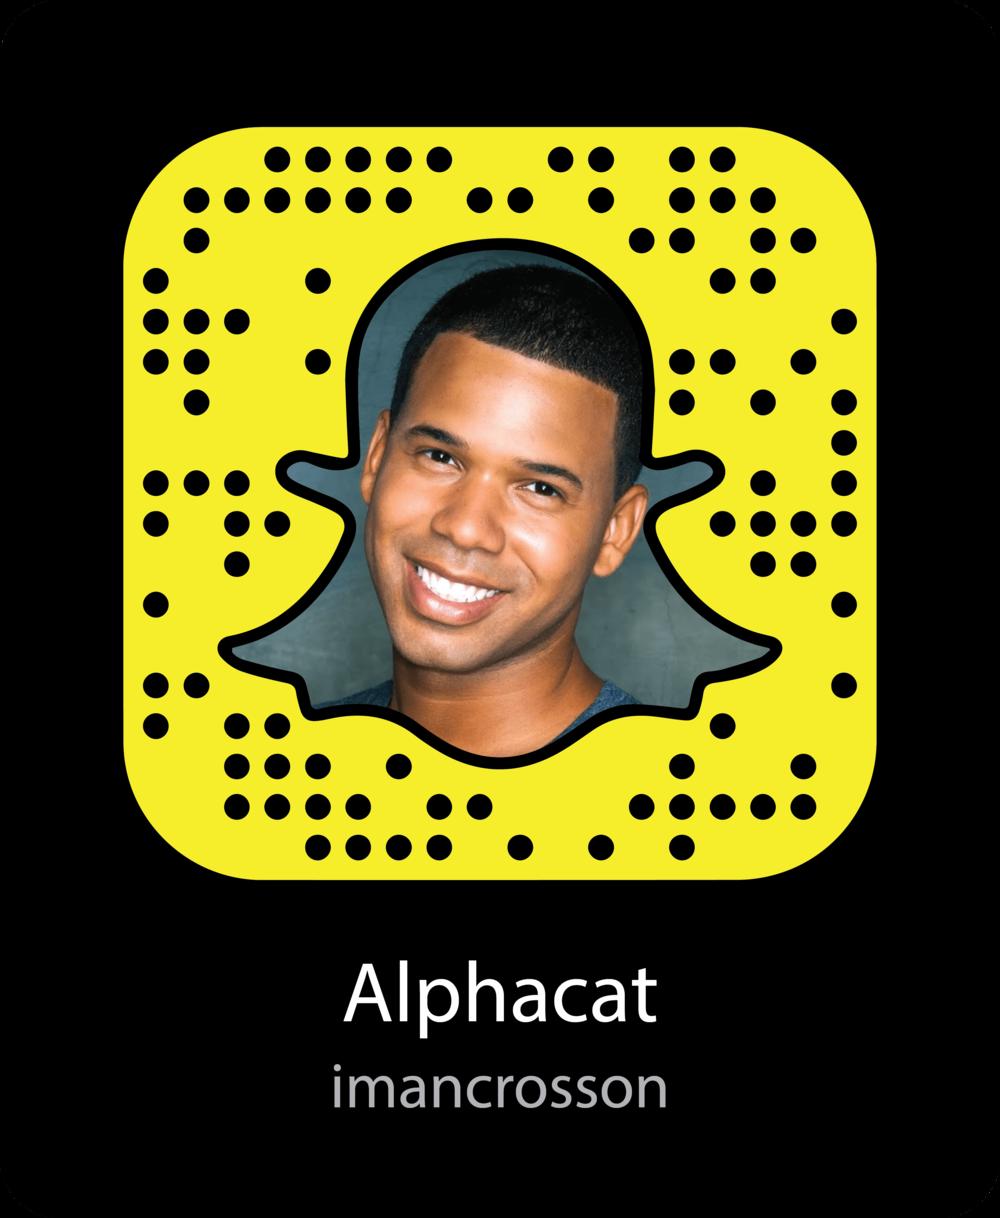 alphacat-vine-celebrity-snapchat-snapcode